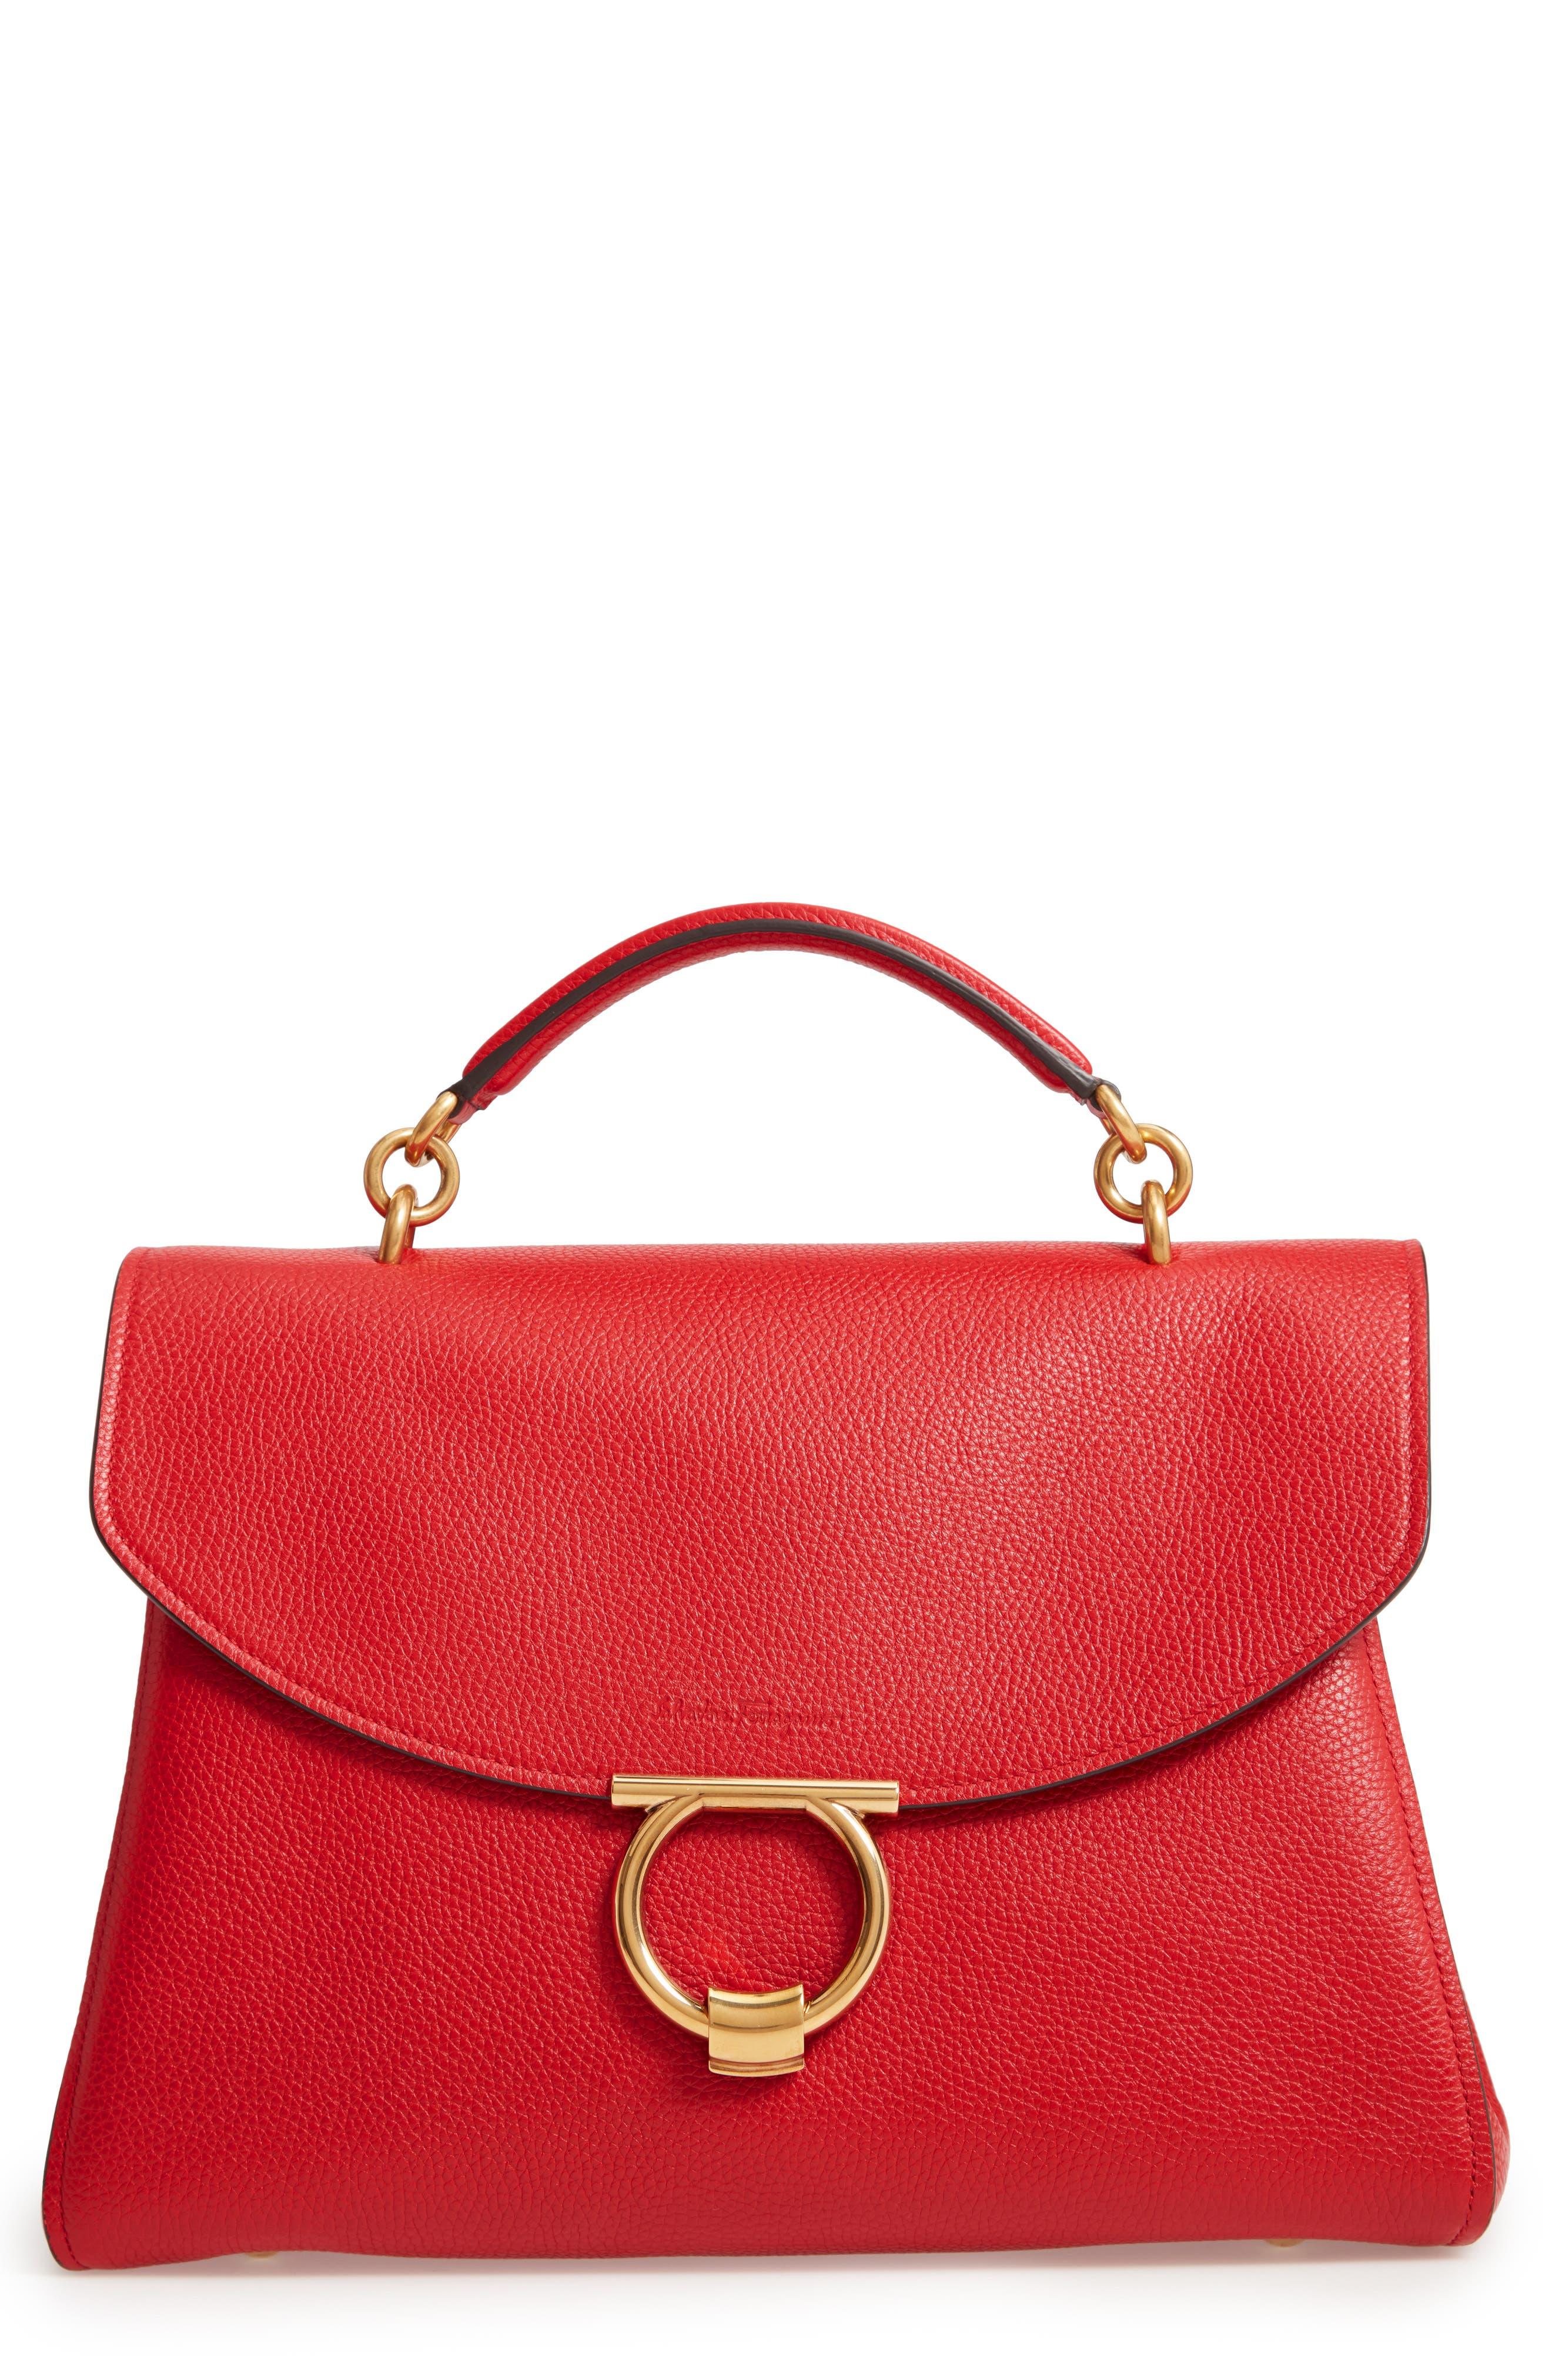 Flap Shoulder Bag,                             Main thumbnail 1, color,                             600